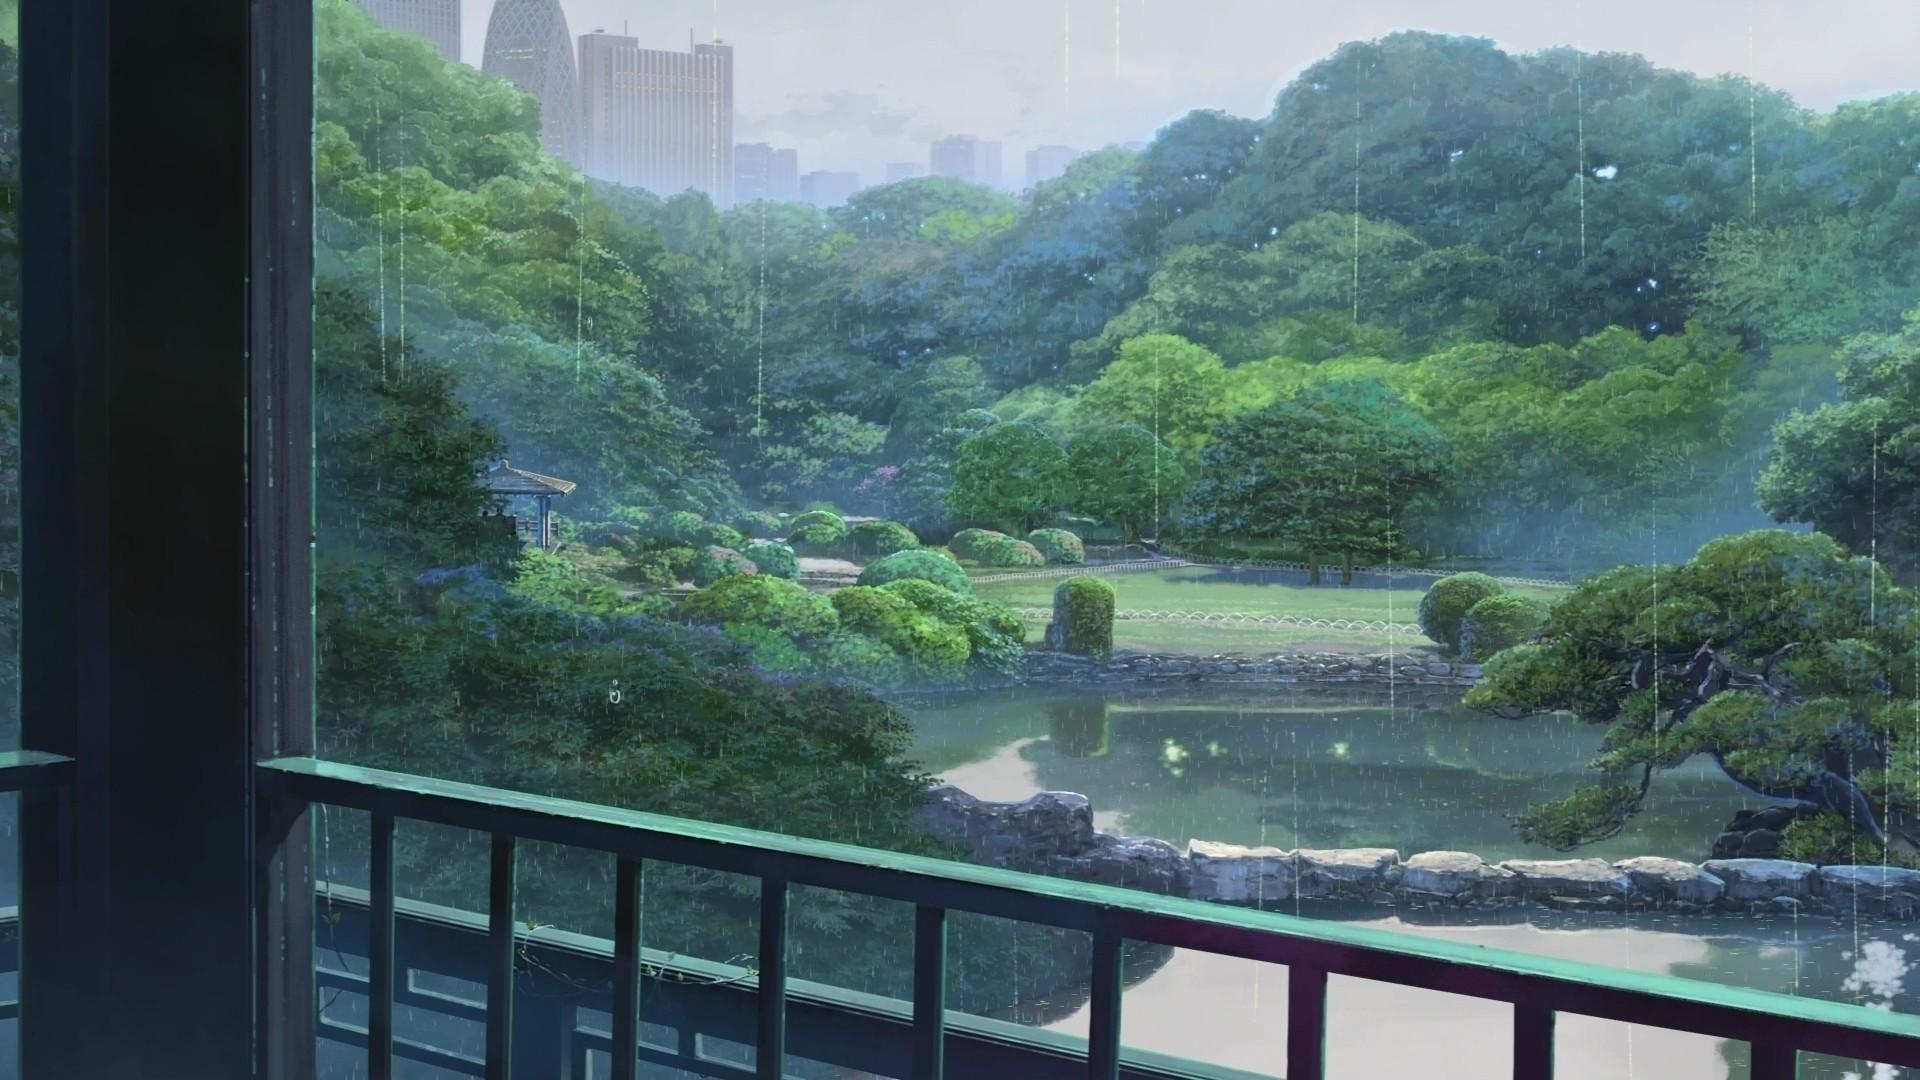 Wallpaper 1920x1080 Px Anime Makoto Shinkai The Garden Of Words 1920x1080 Wallup 1498651 Hd Wallpapers Wallhere